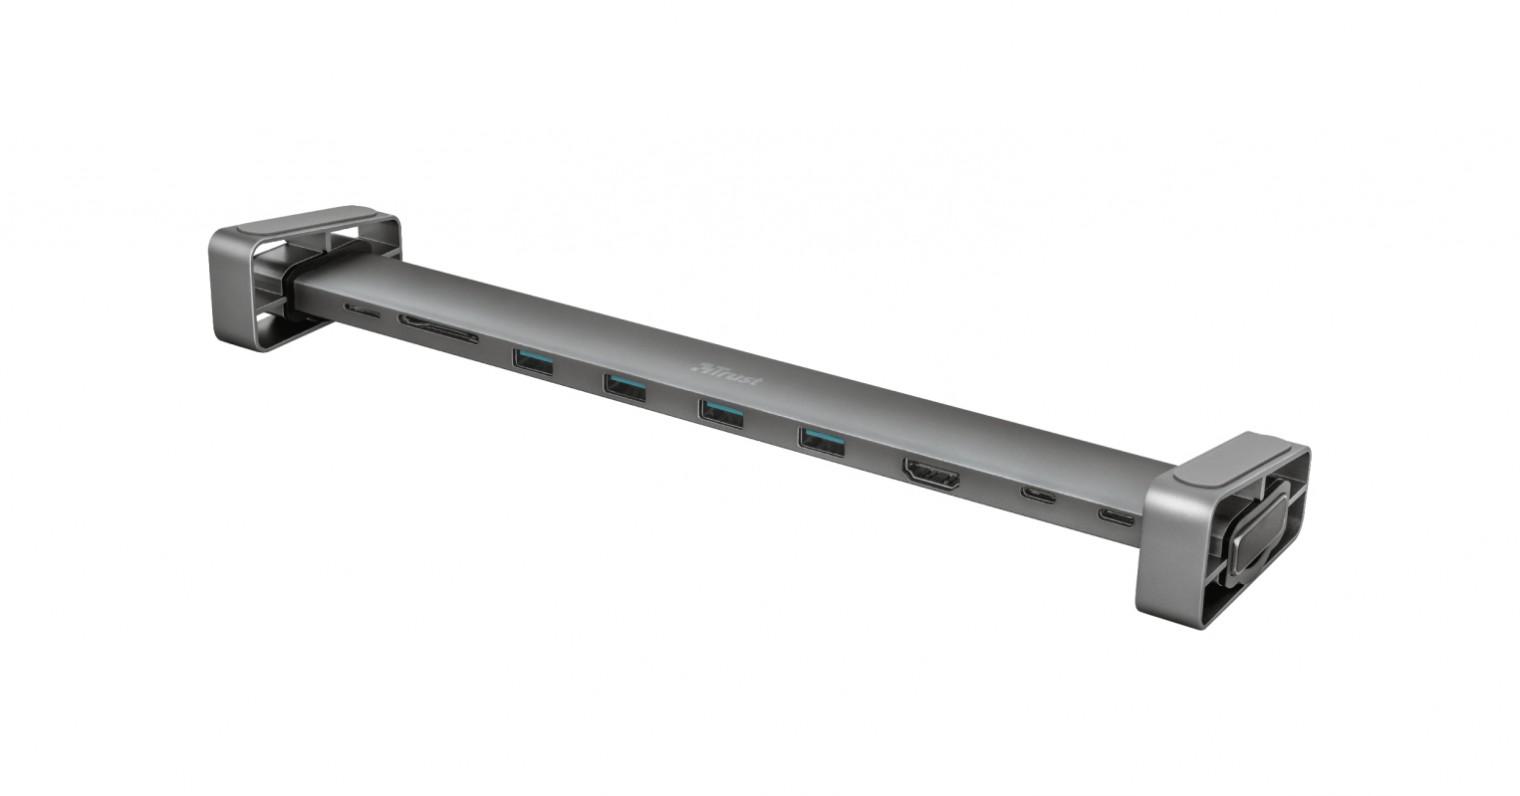 Dokovacie stanice Multiportový adaptér Trust Dalyx 10 v 1, USB-C, HDMI port